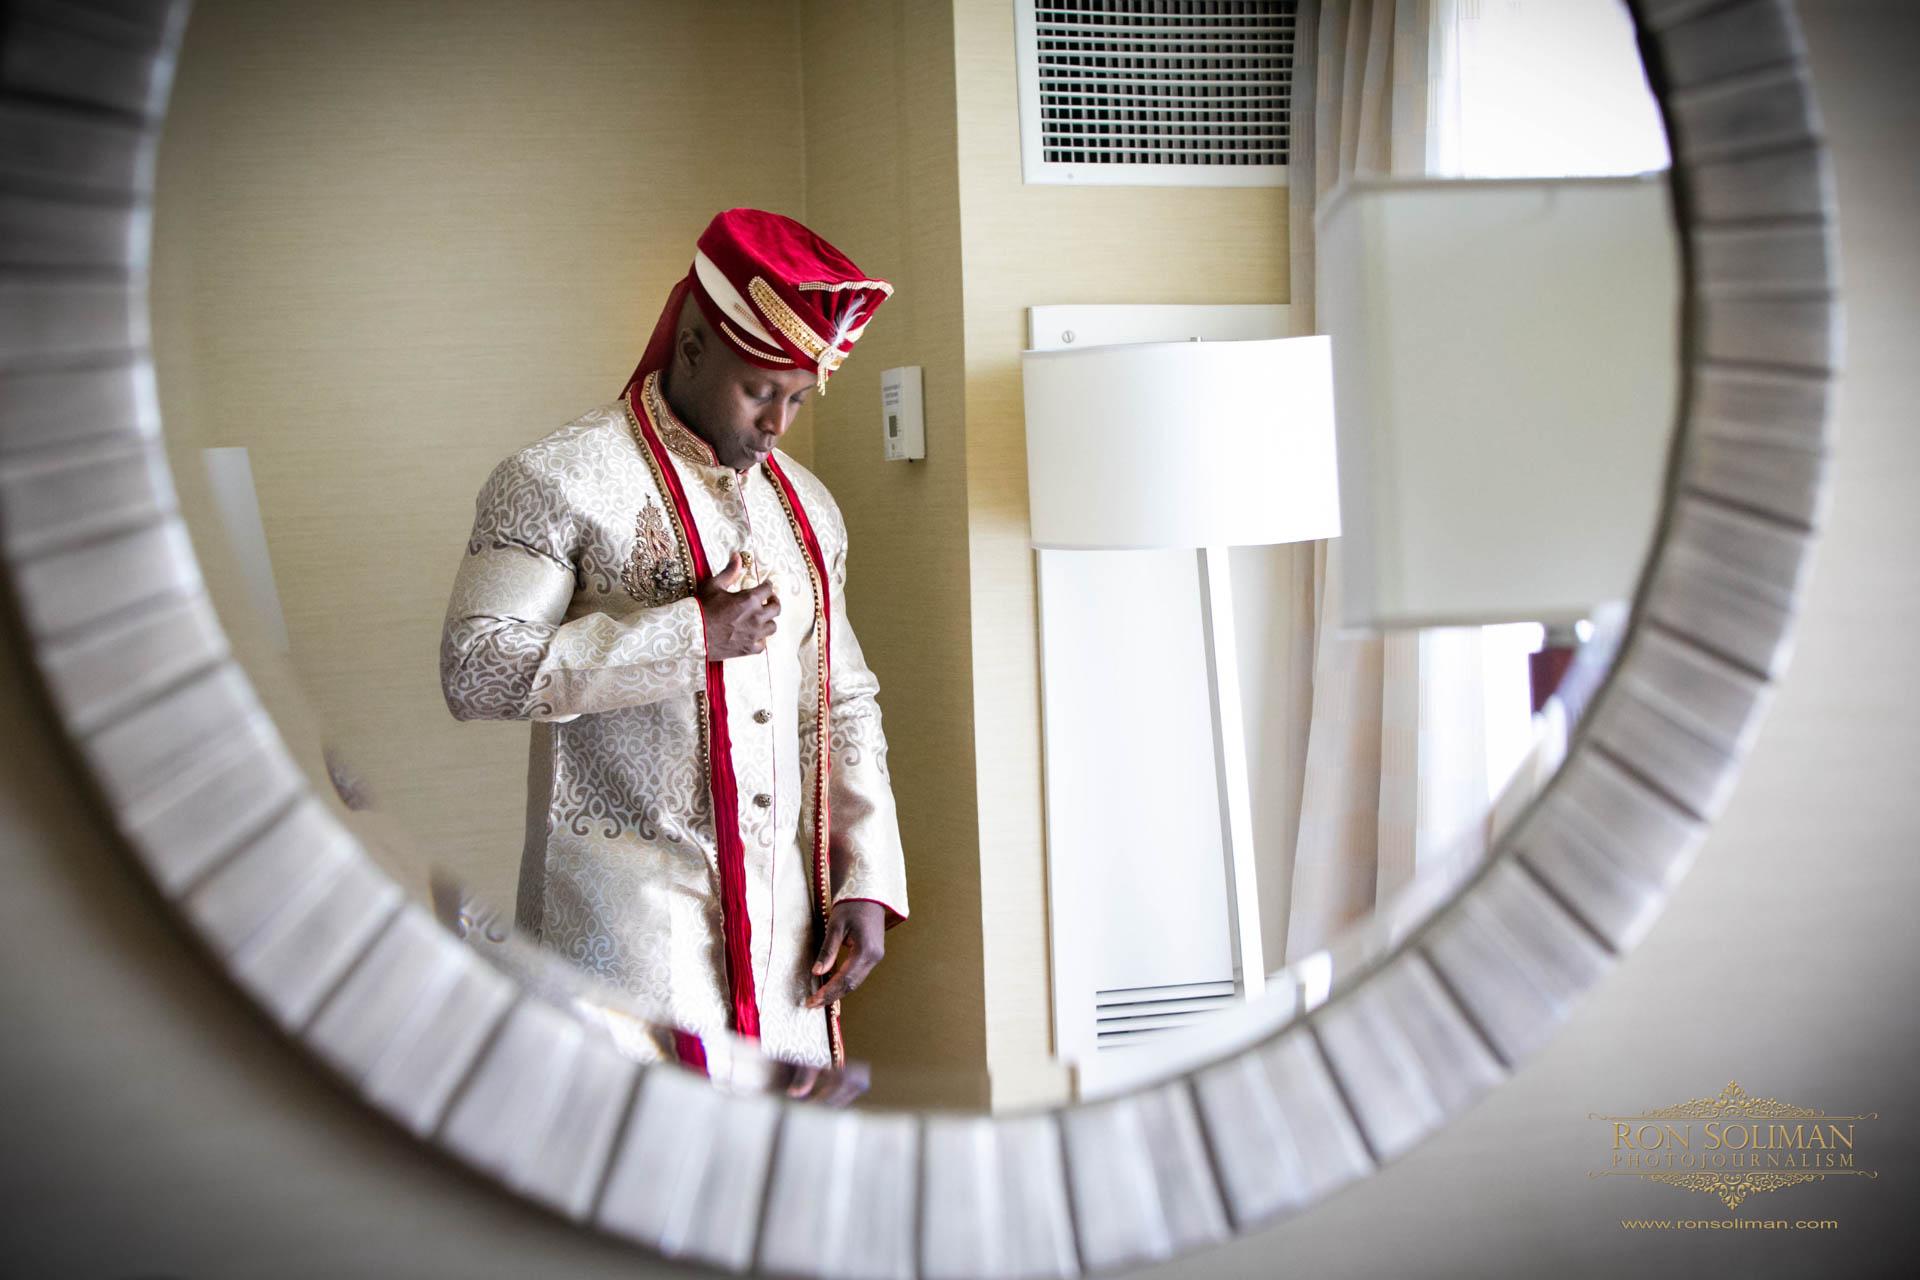 Gaithersburg Marriott Washingtonian Center Wedding 04